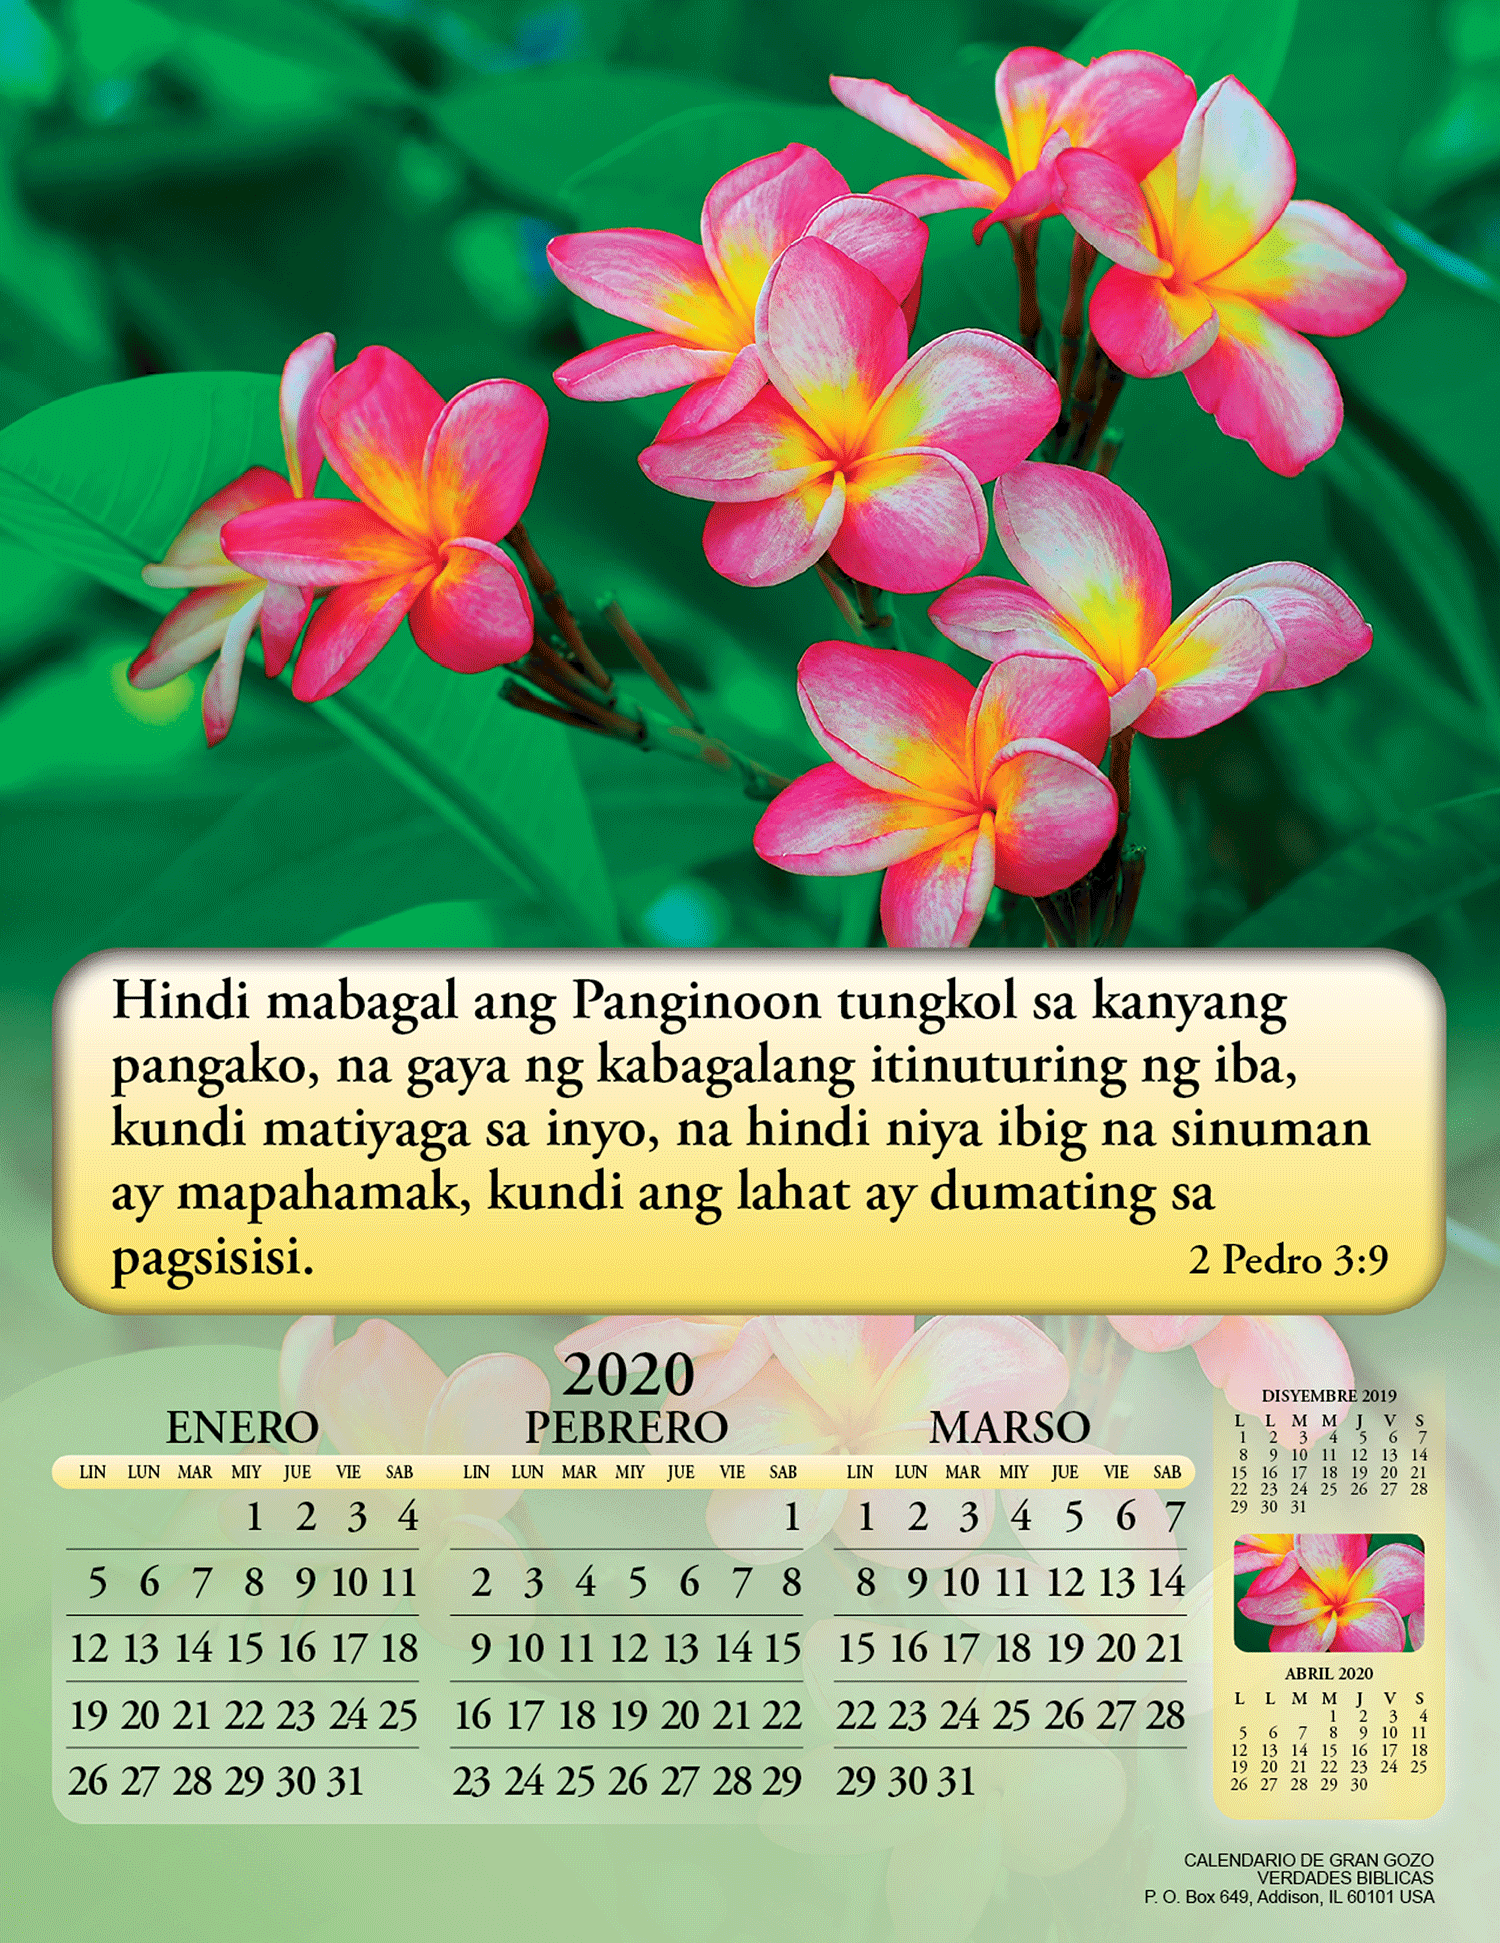 Mini Calendario 2020 Png.Tagalog Joyful News Gospel Calendar 3878 Bible Truth